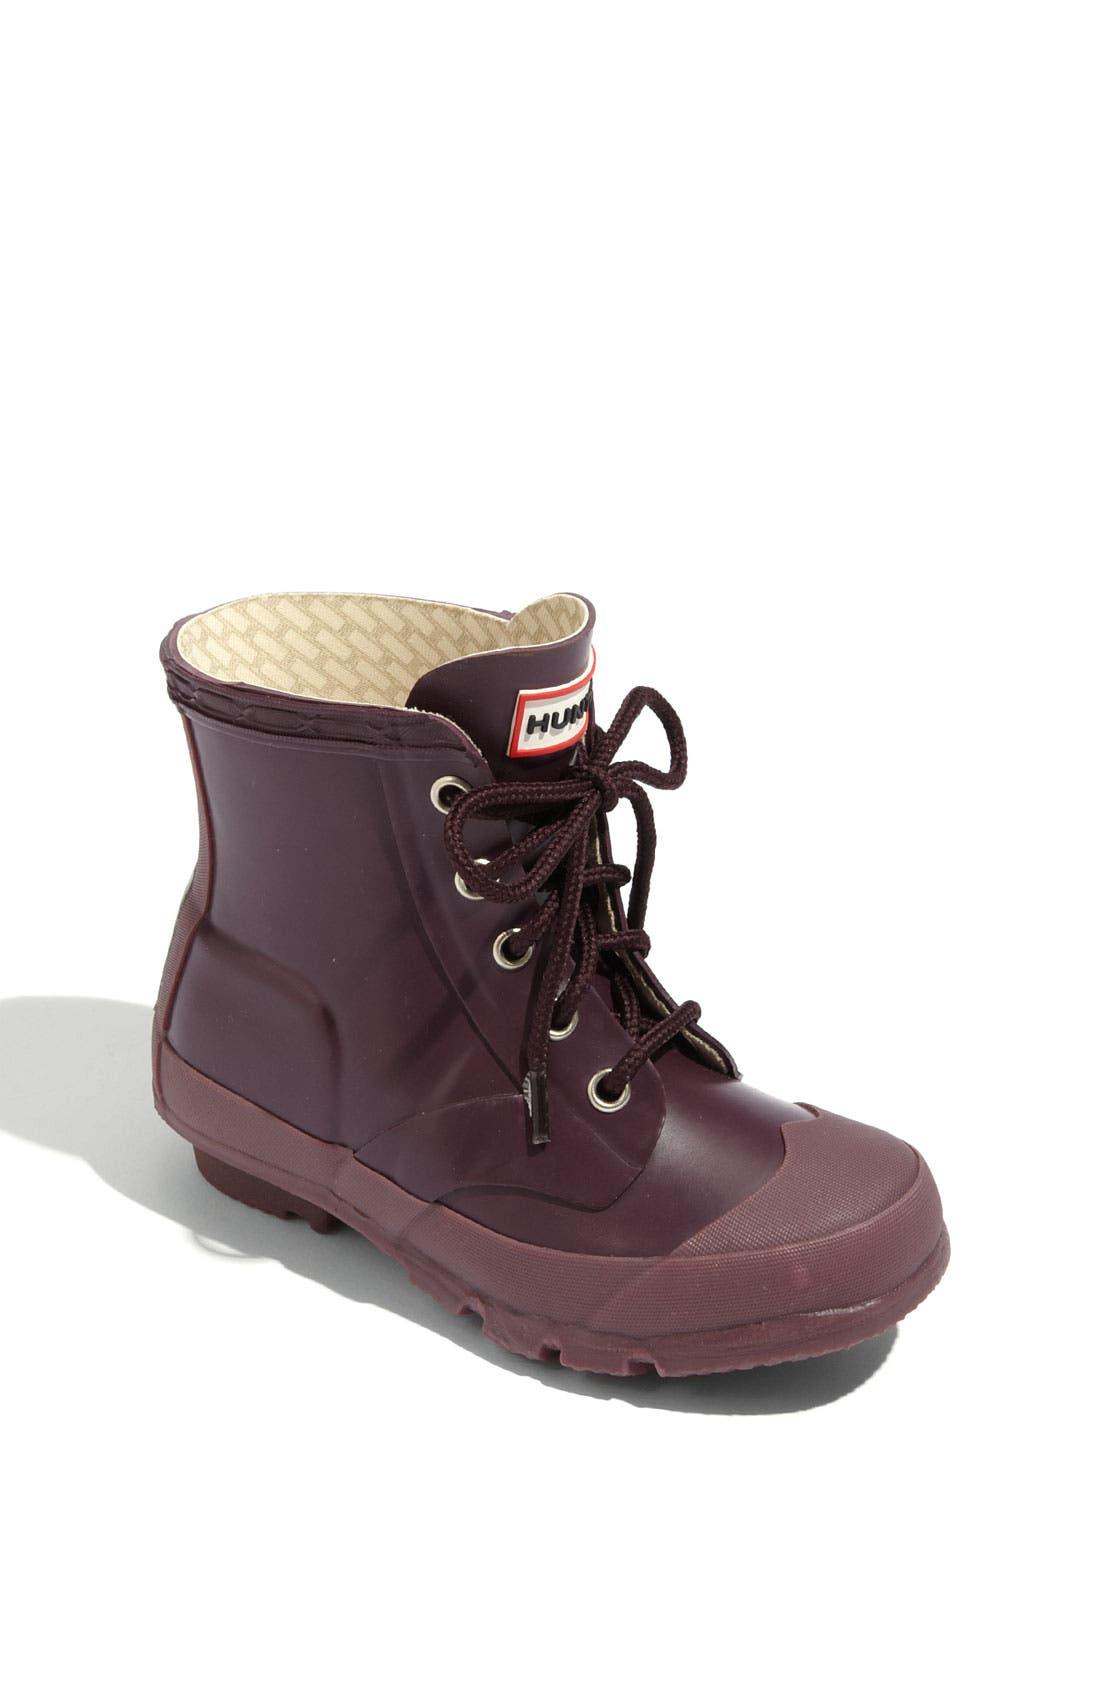 Alternate Image 1 Selected - Hunter 'Petite Brixen' Boot (Toddler & Little Kid)